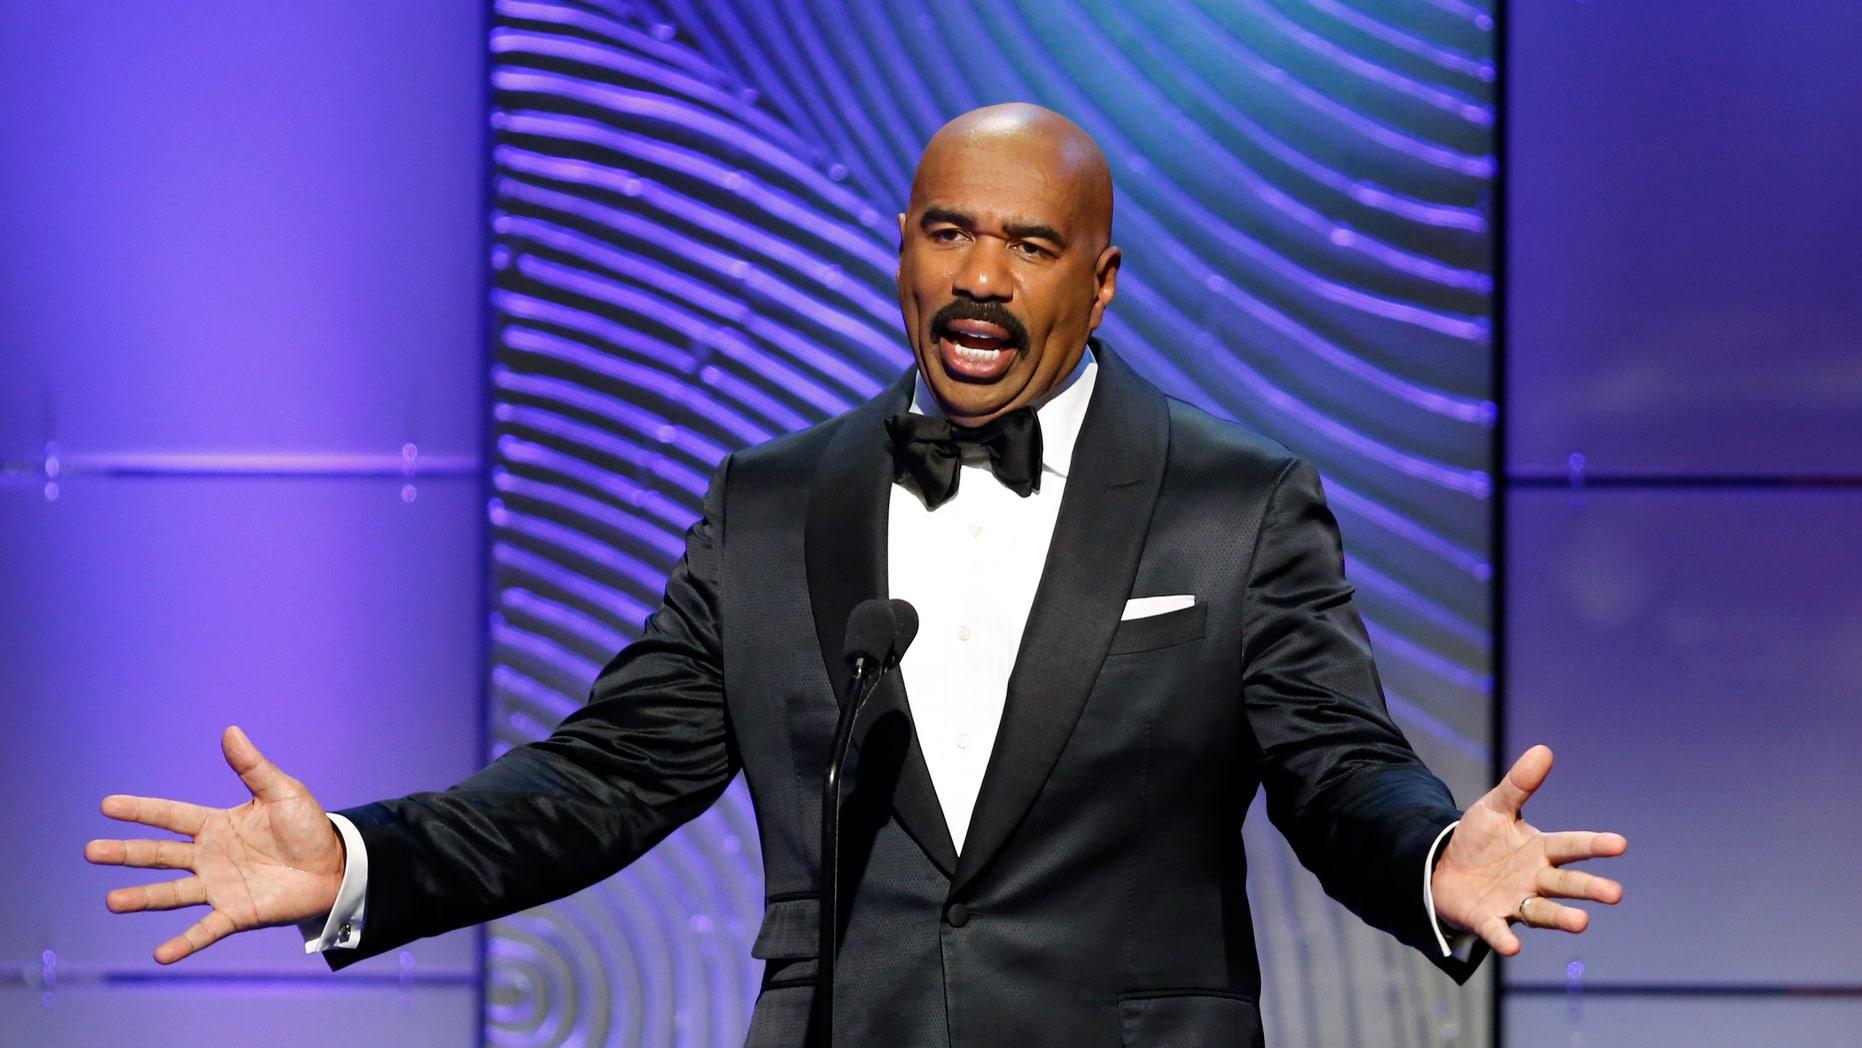 TV host Steve Harvey presents the outstanding morning program award during the 40th annual Daytime Emmy Awards in Beverly Hills, California June 16, 2013.